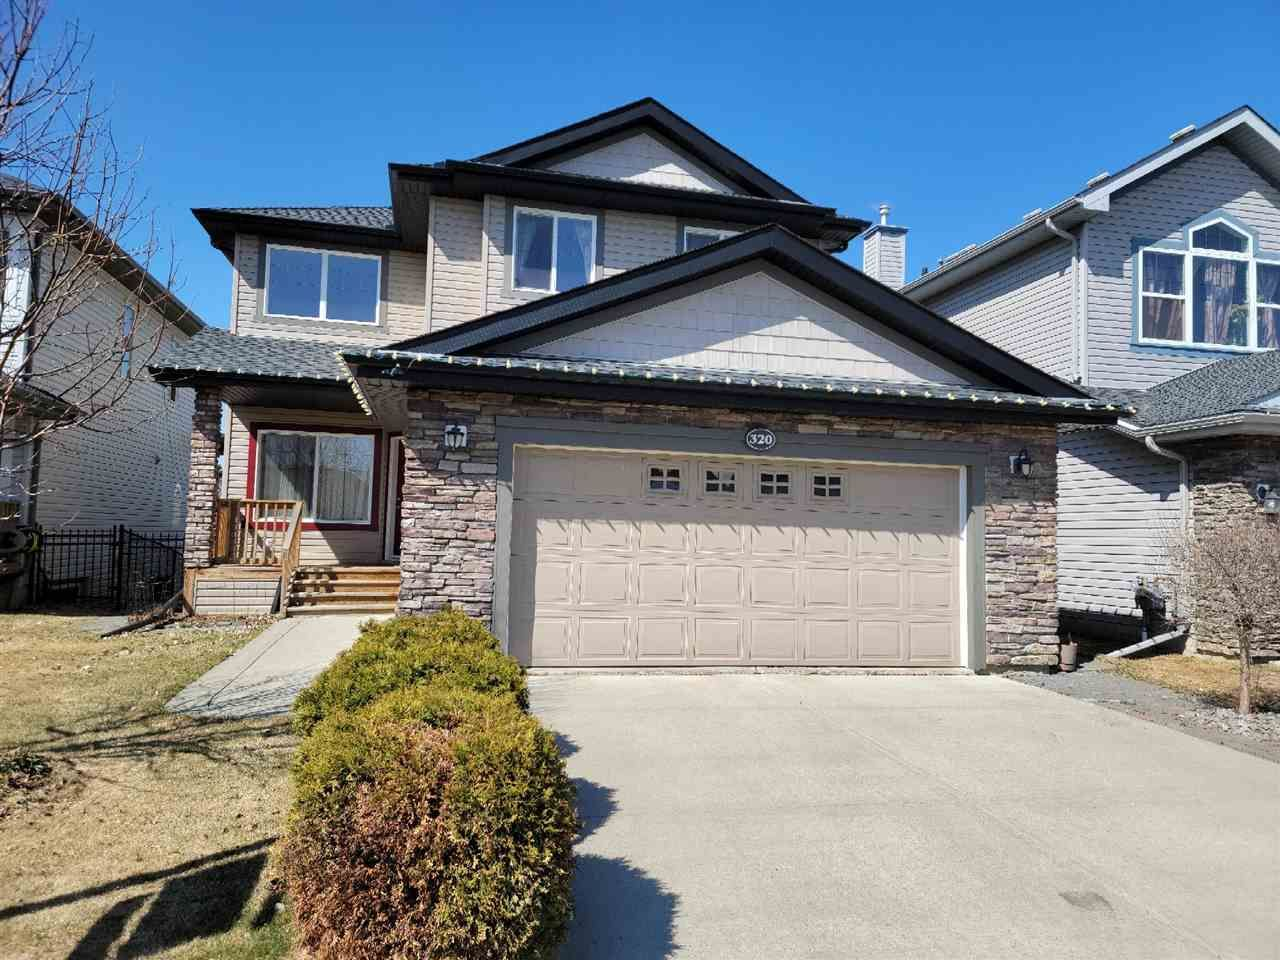 Main Photo: 320 65 Street in Edmonton: Zone 53 House for sale : MLS®# E4229354